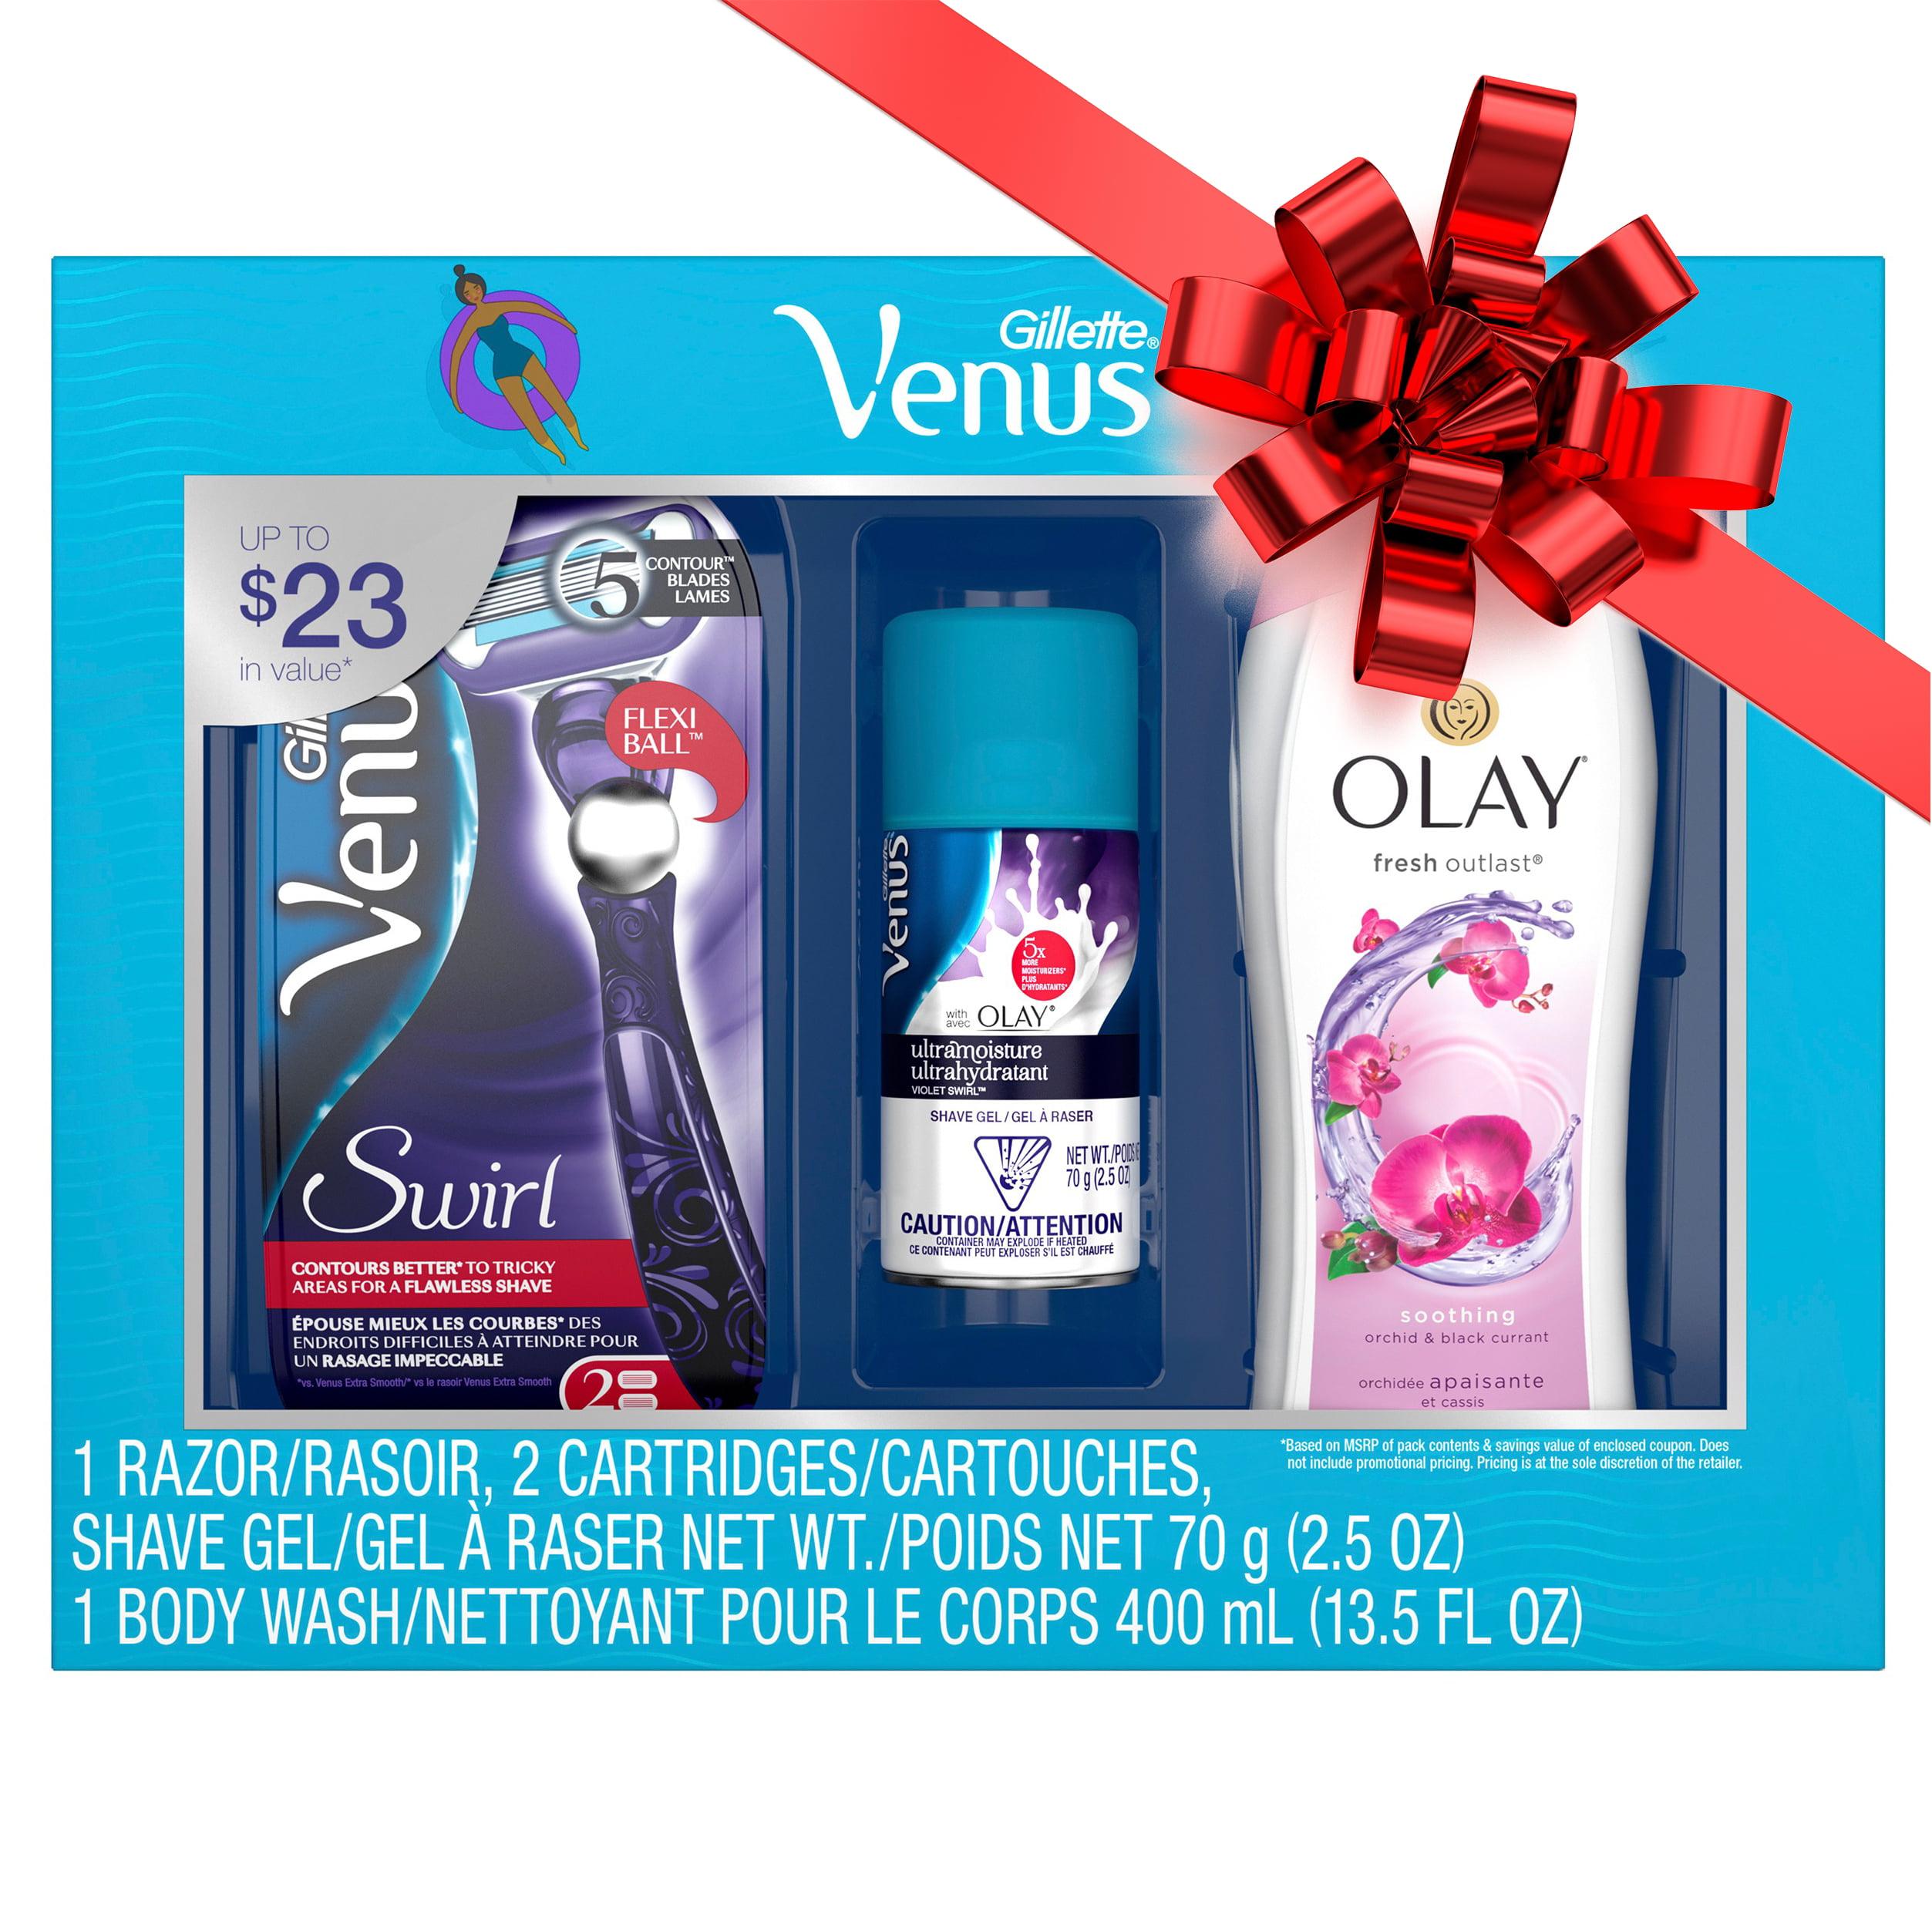 Gillette® Venus Swirl Razor Gift Pack